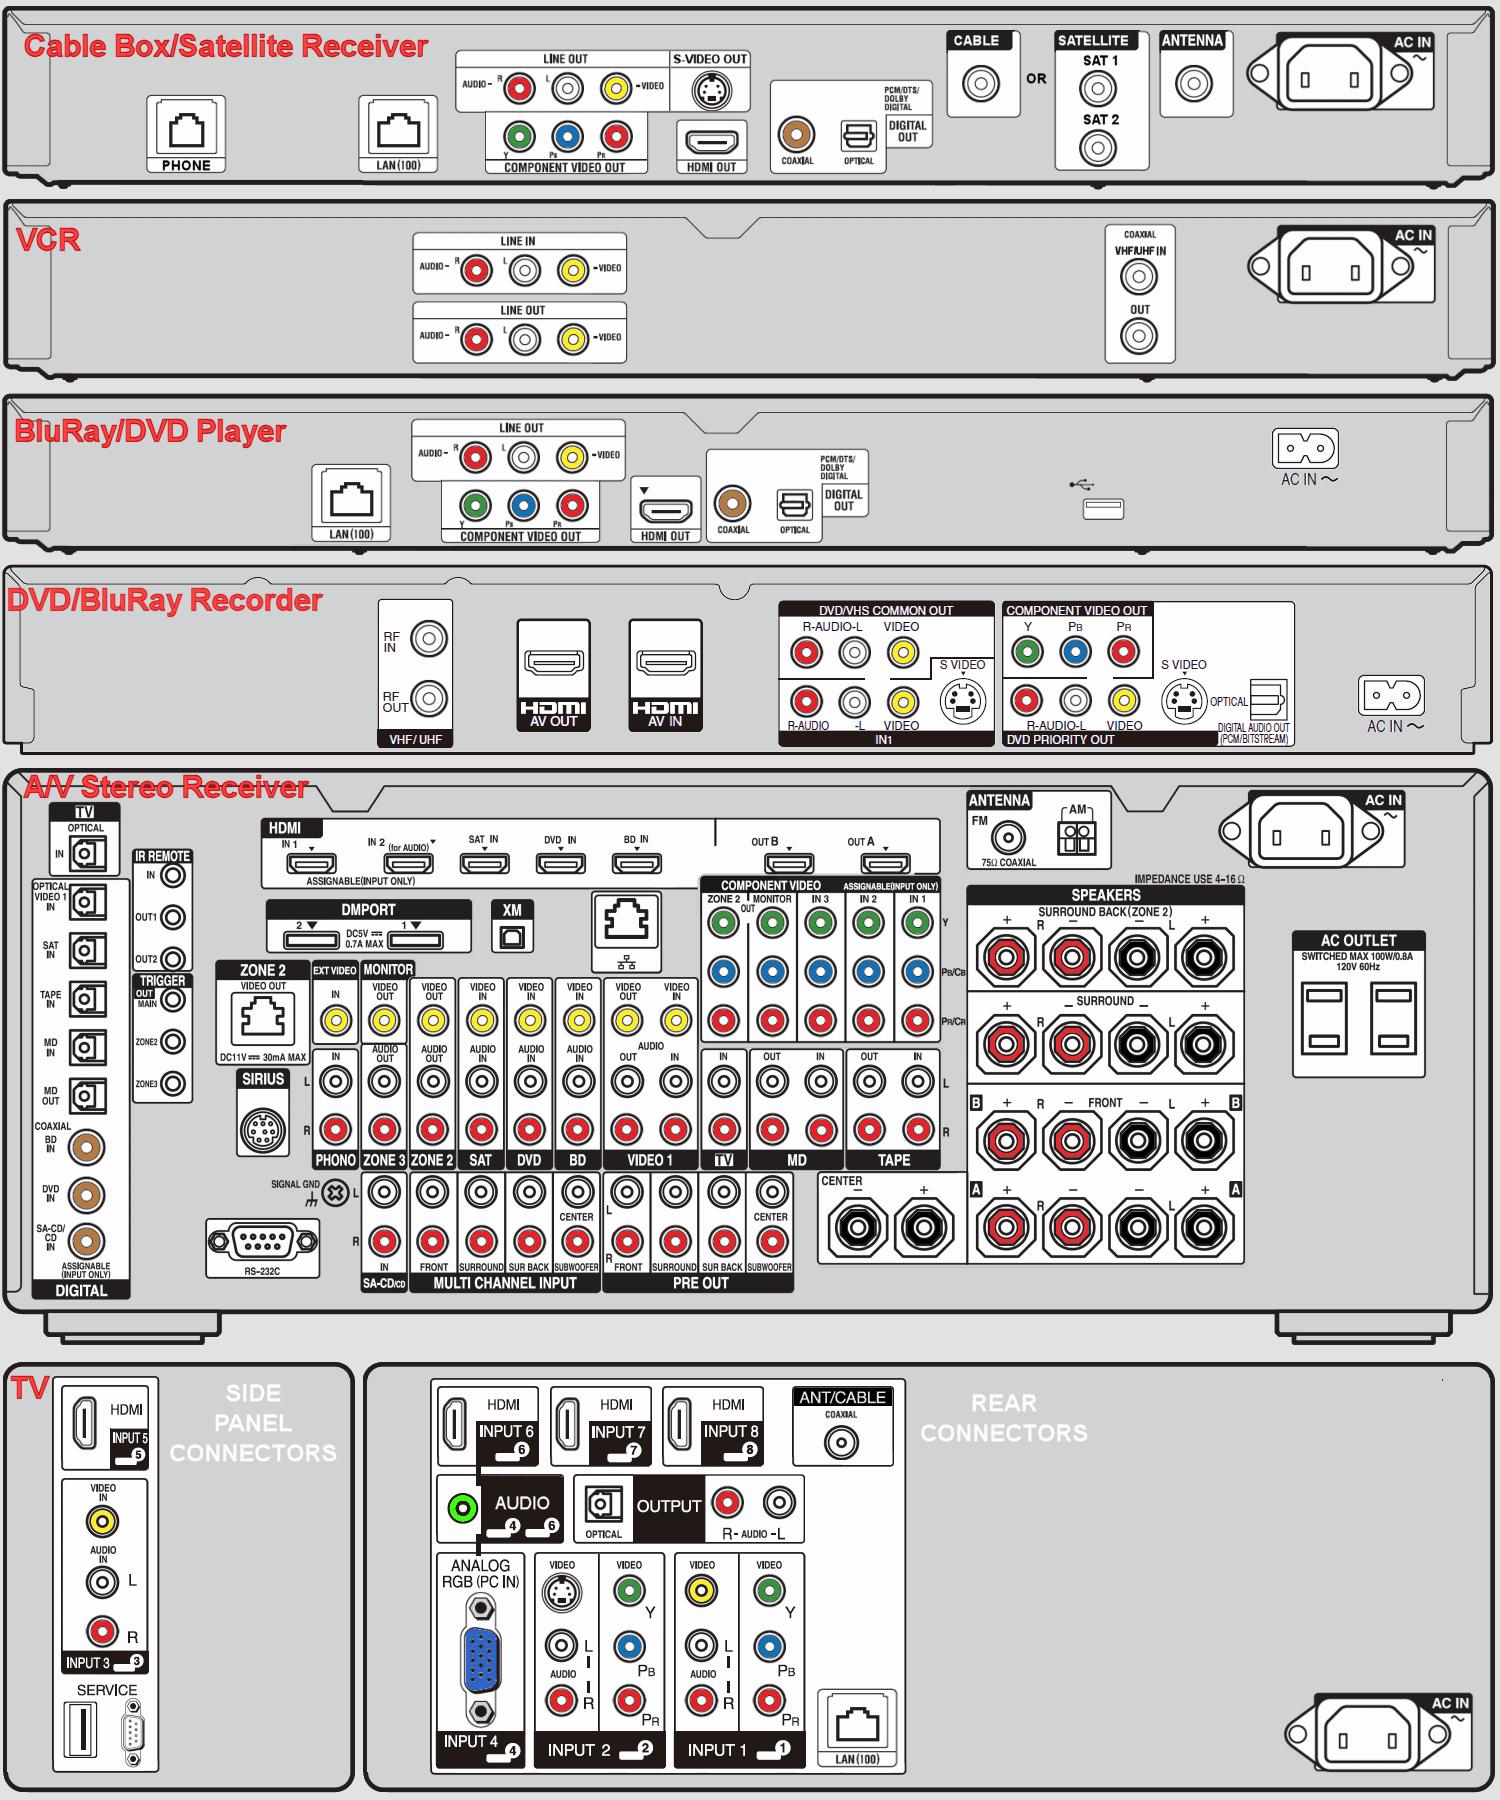 Components?resize=665%2C798 ted360beac0b6 wiring diagrams ted360beac0b6 wiring diagrams Basic Electrical Wiring Diagrams at soozxer.org